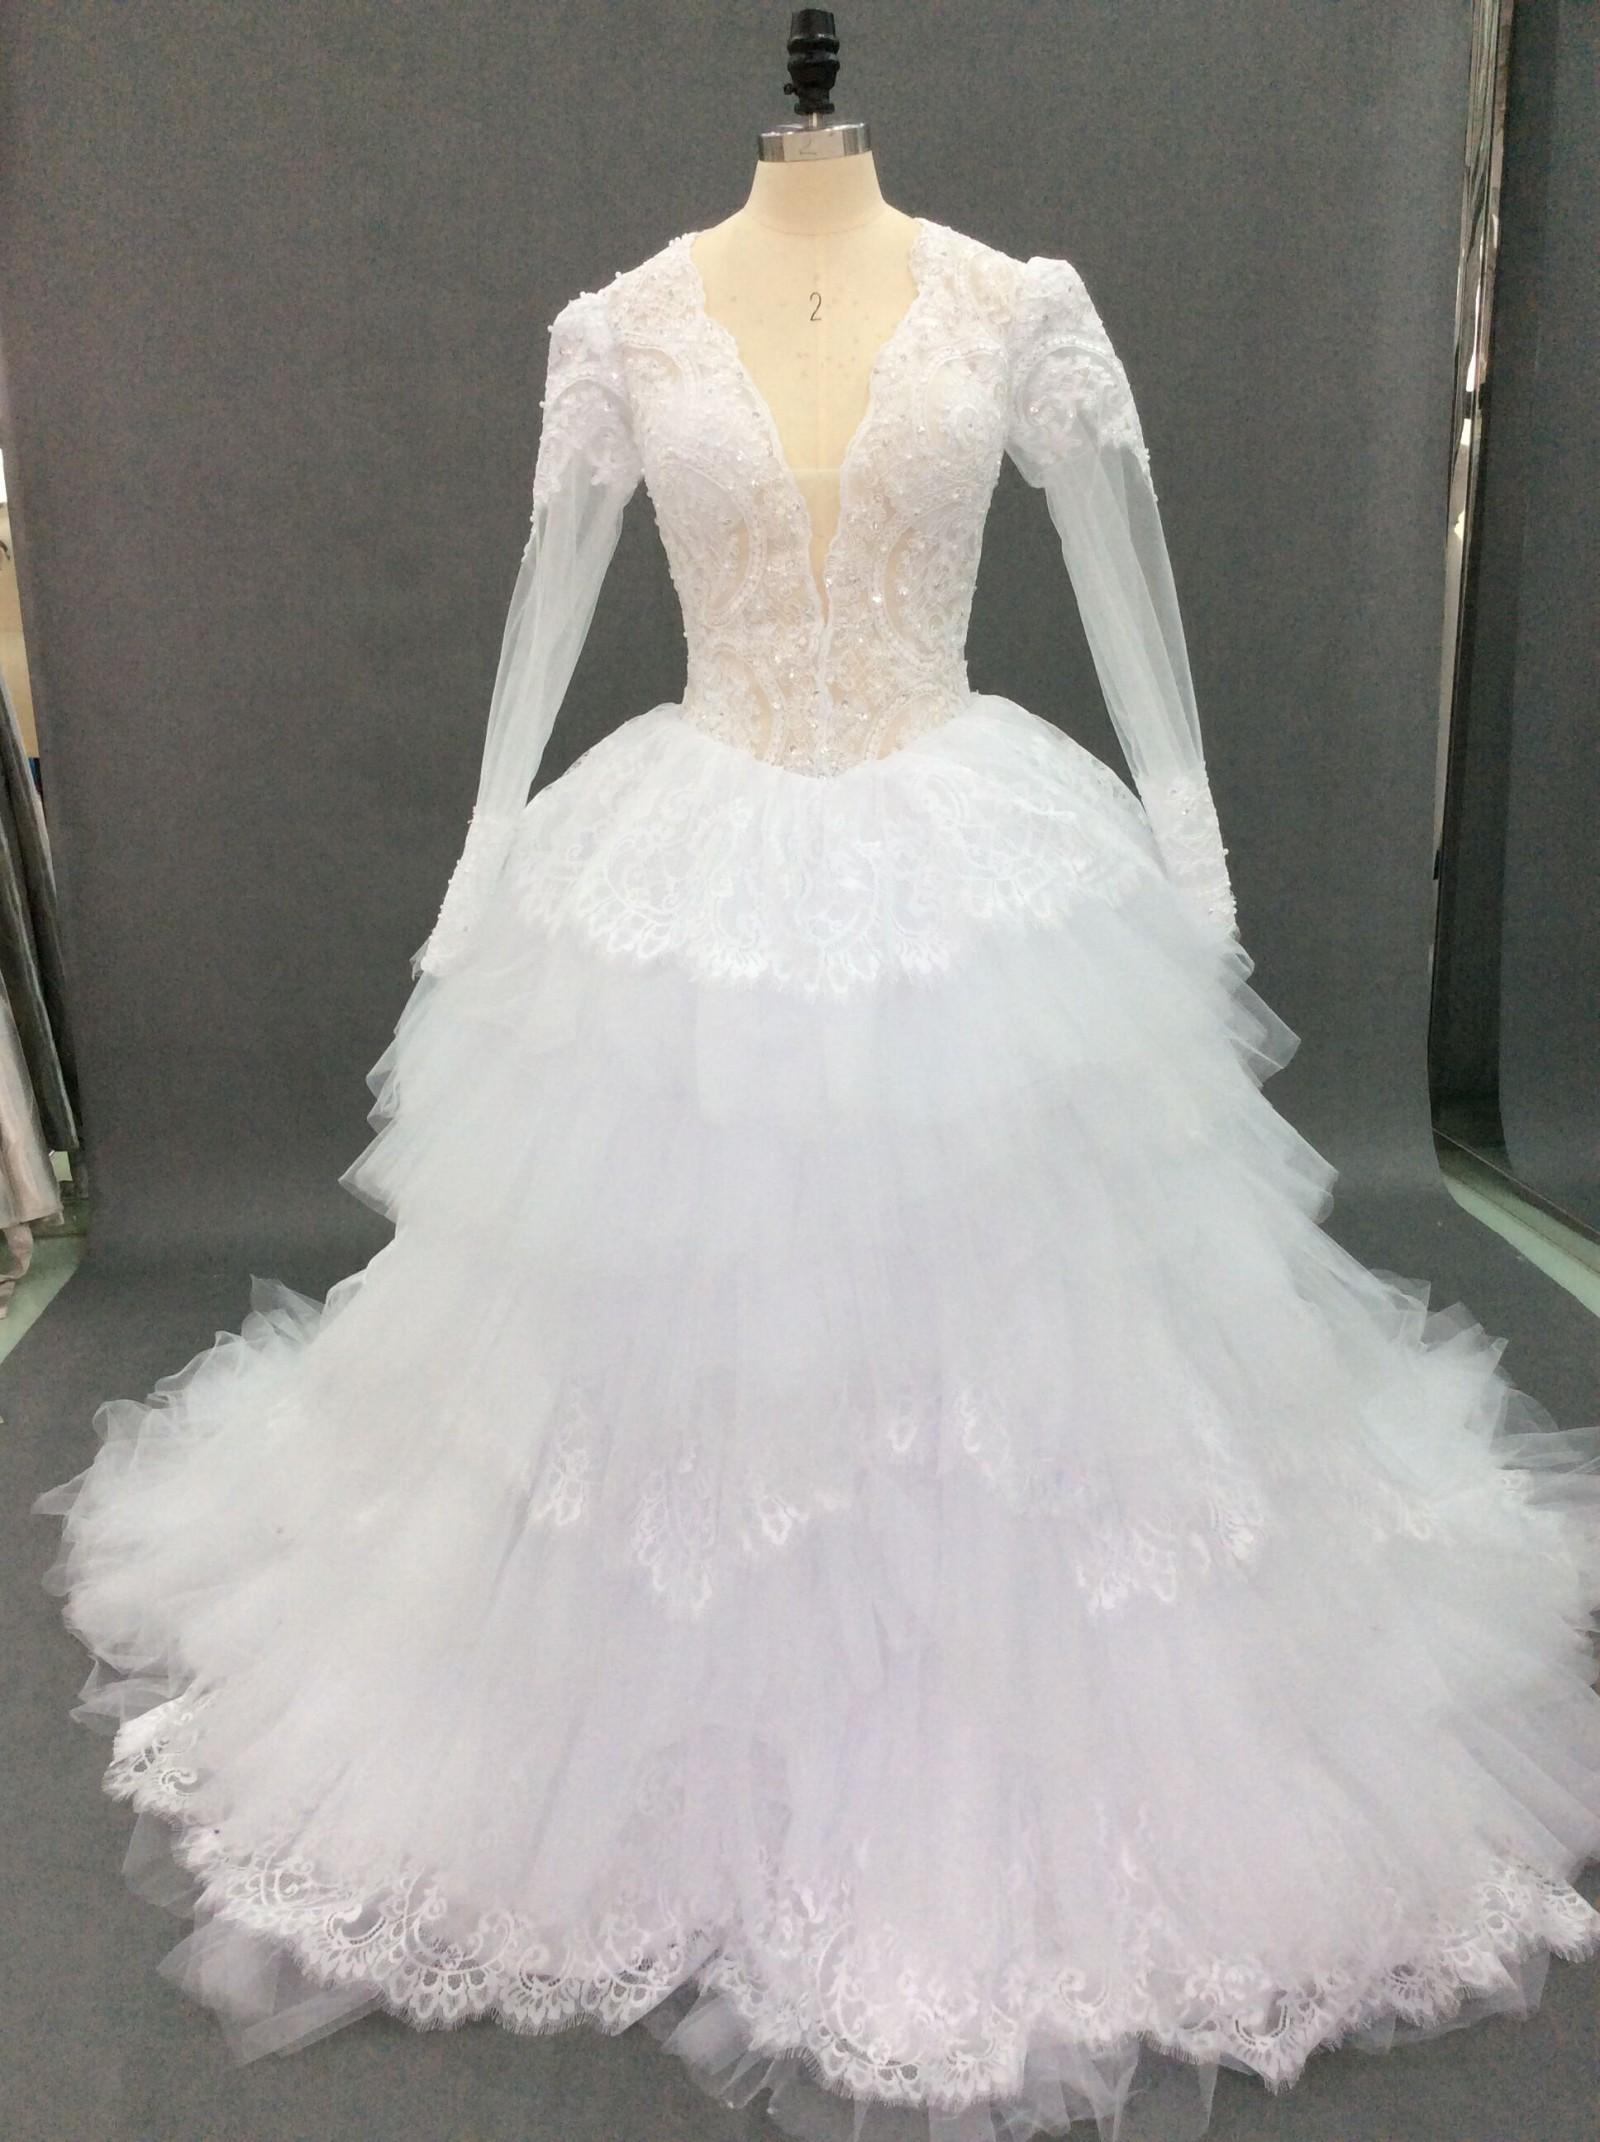 f3def7286aeec Darius Cordell Pnina Tornai Inspired Wedding Gown New Wedding Dress on Sale  34% Off - Stillwhite Australia